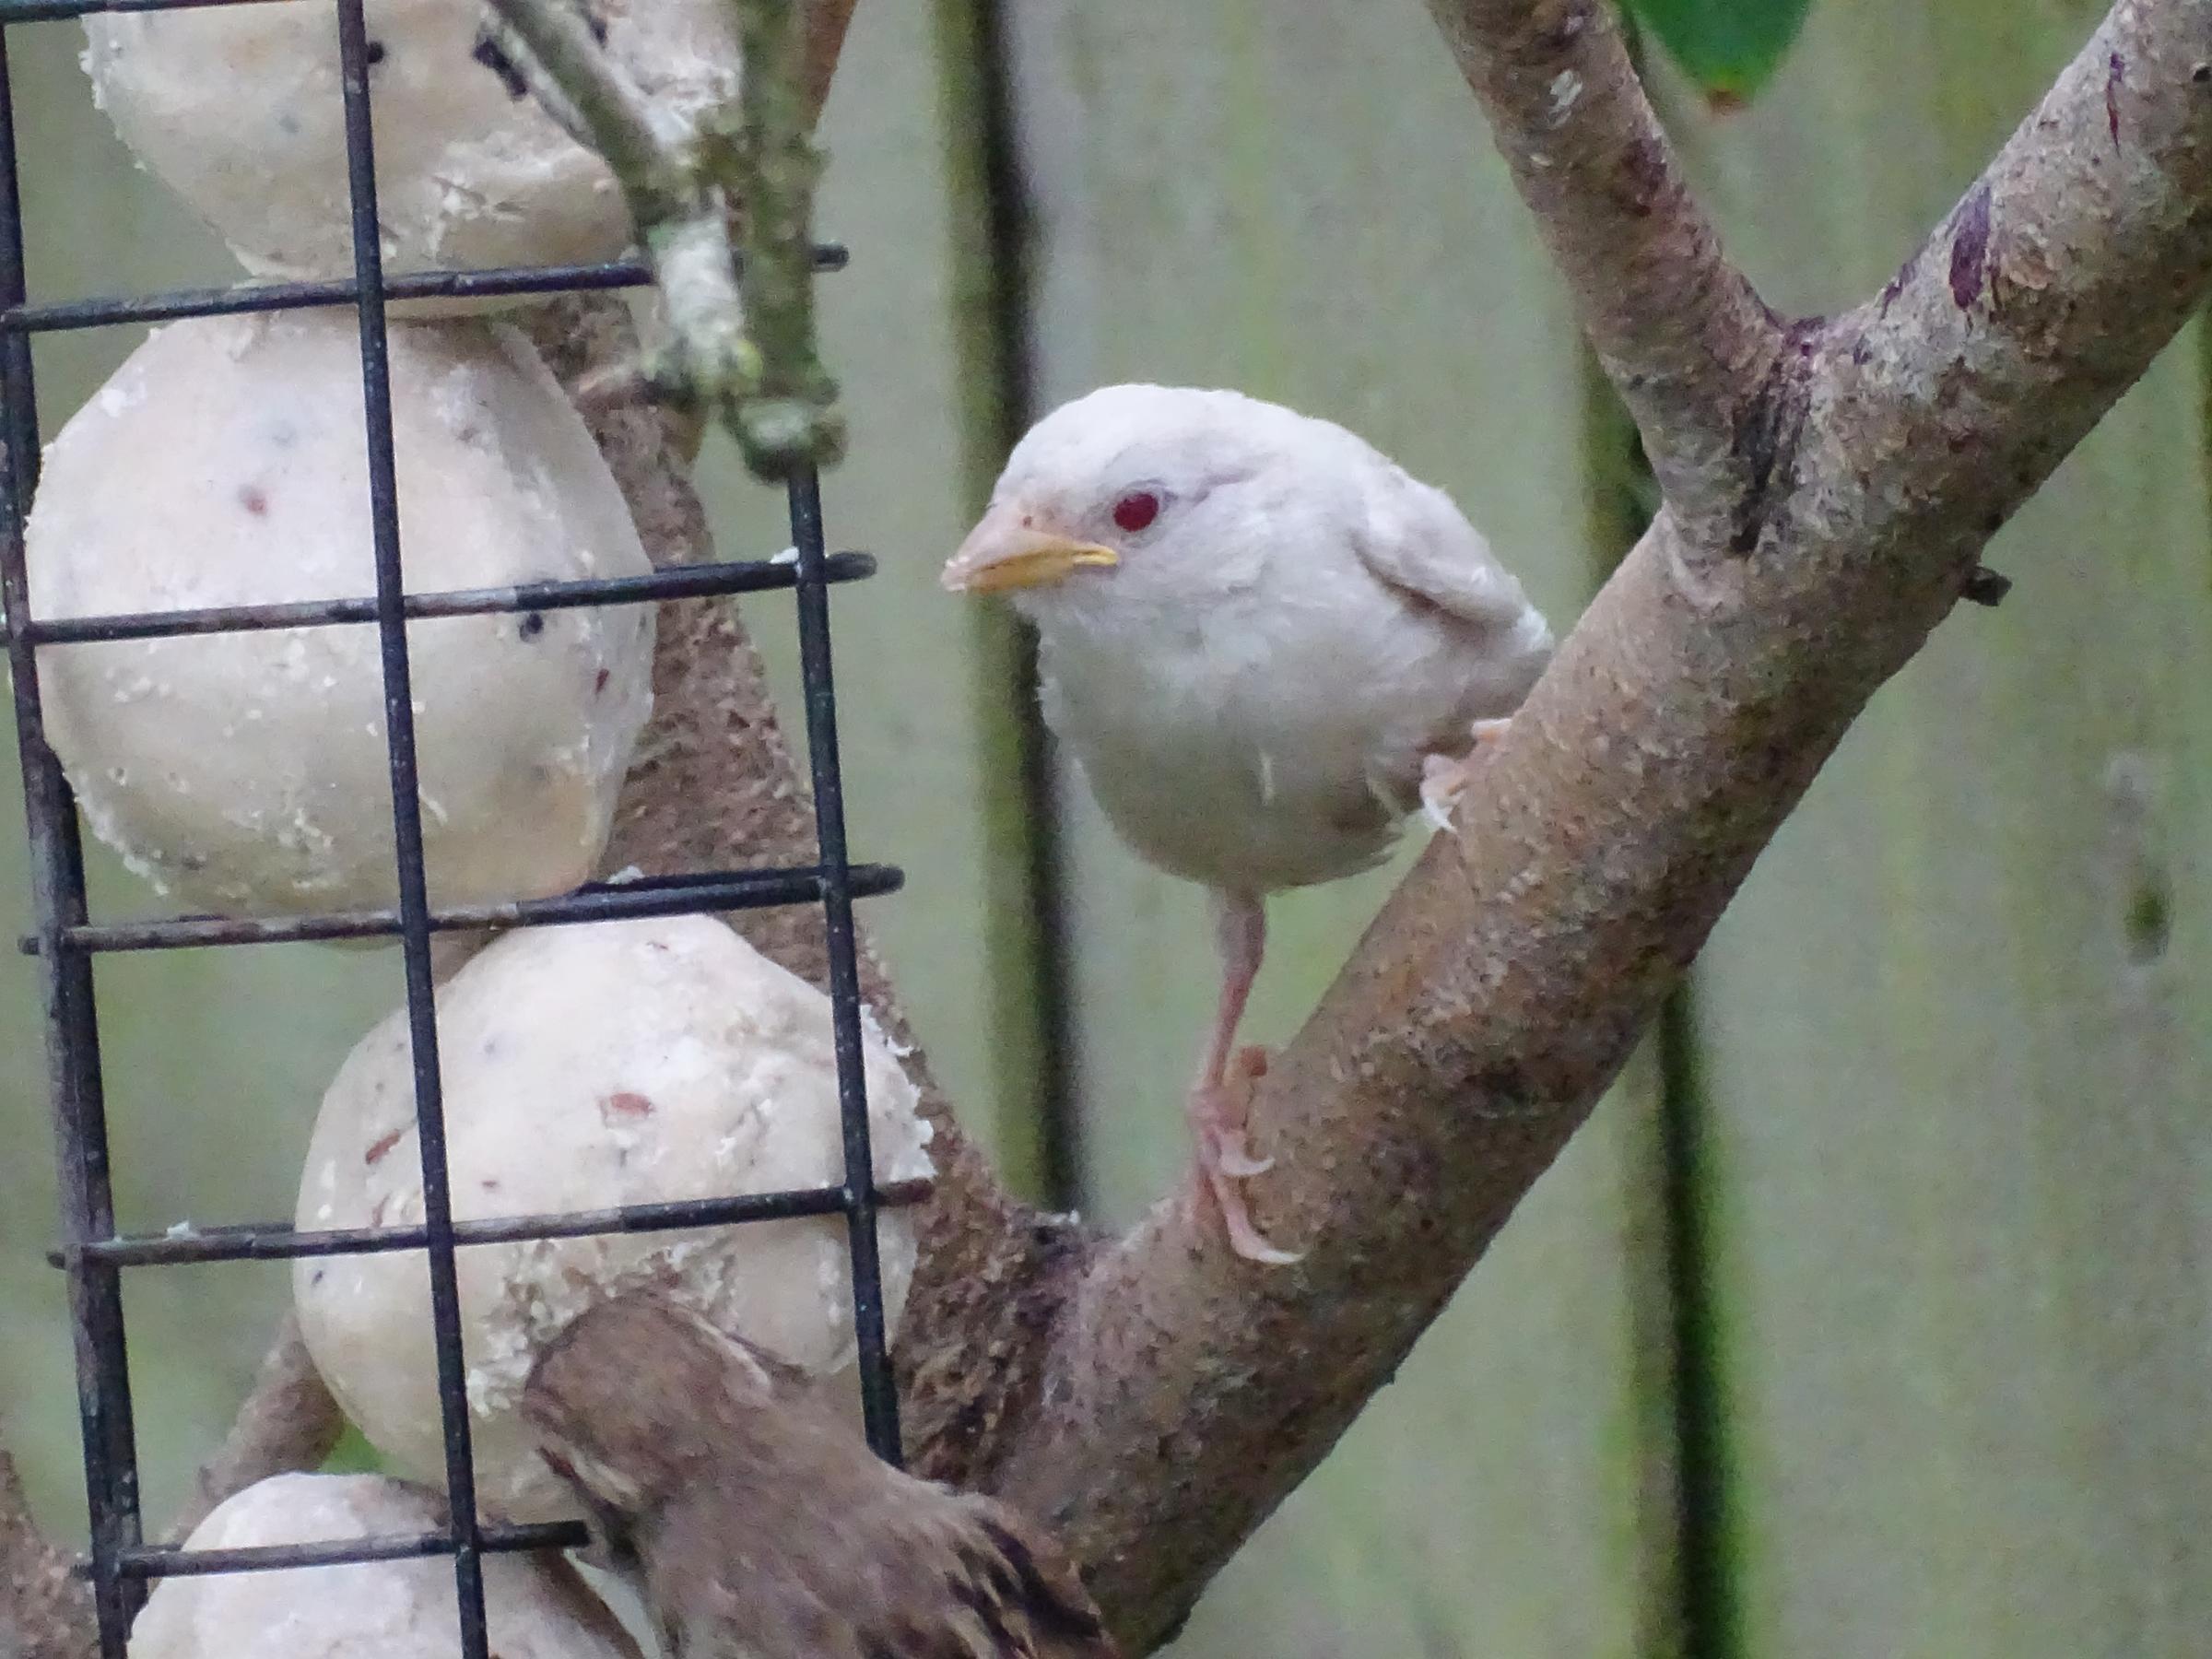 Rare baby albino sparrow lands in nature lover's Royal Wootton Bassett garden